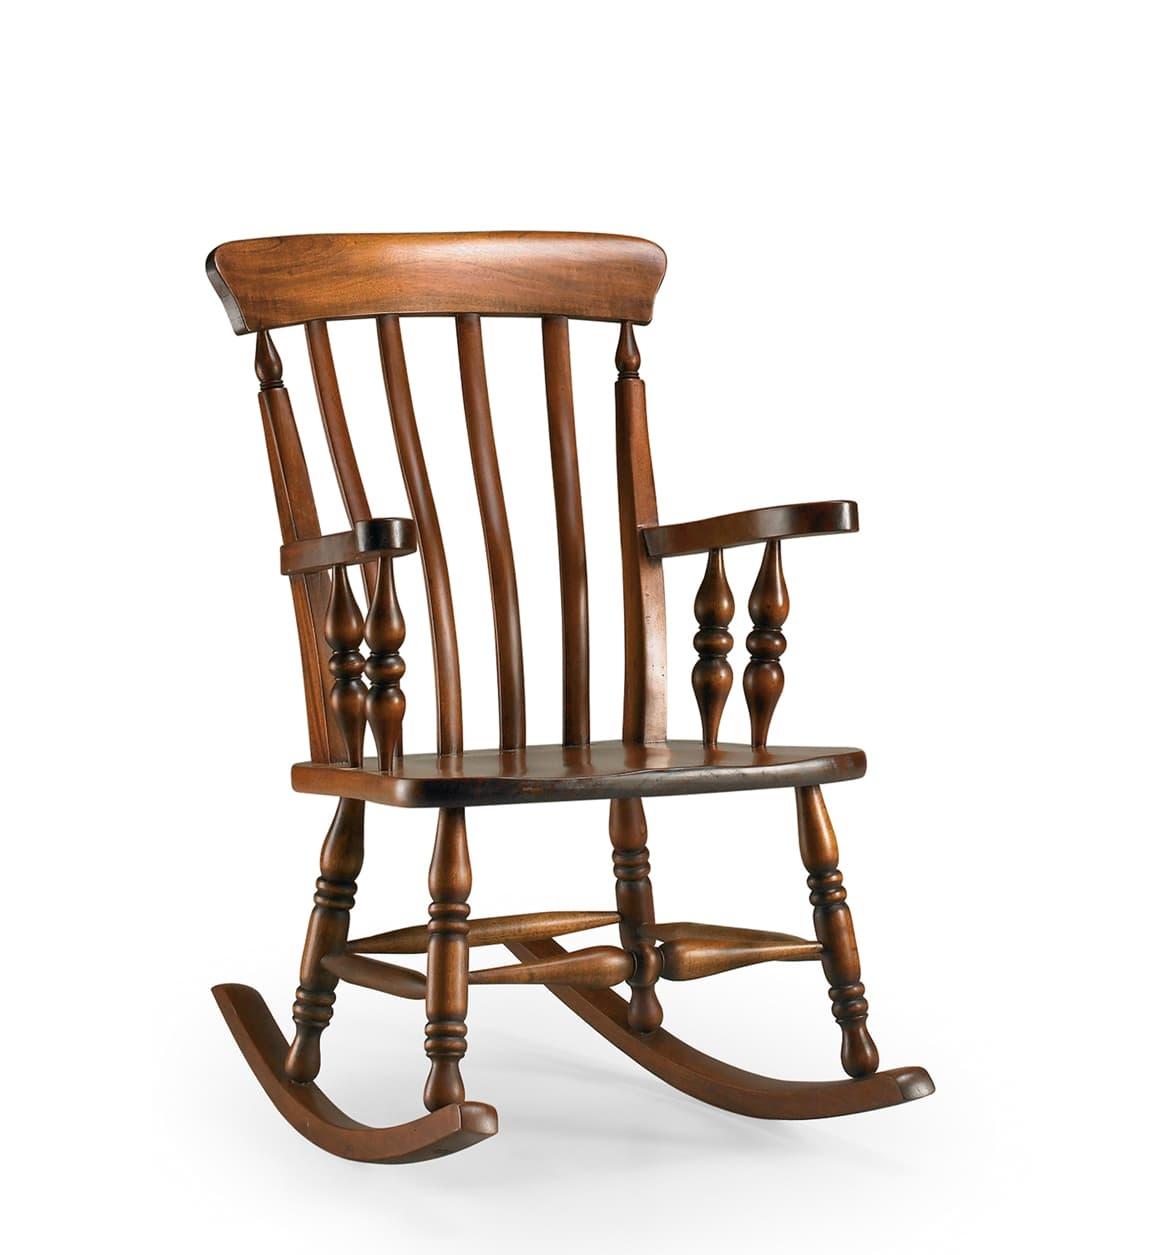 Scaun balansoar din lemn Vintage Nuc, l60xA85xH100 cm somproduct.ro